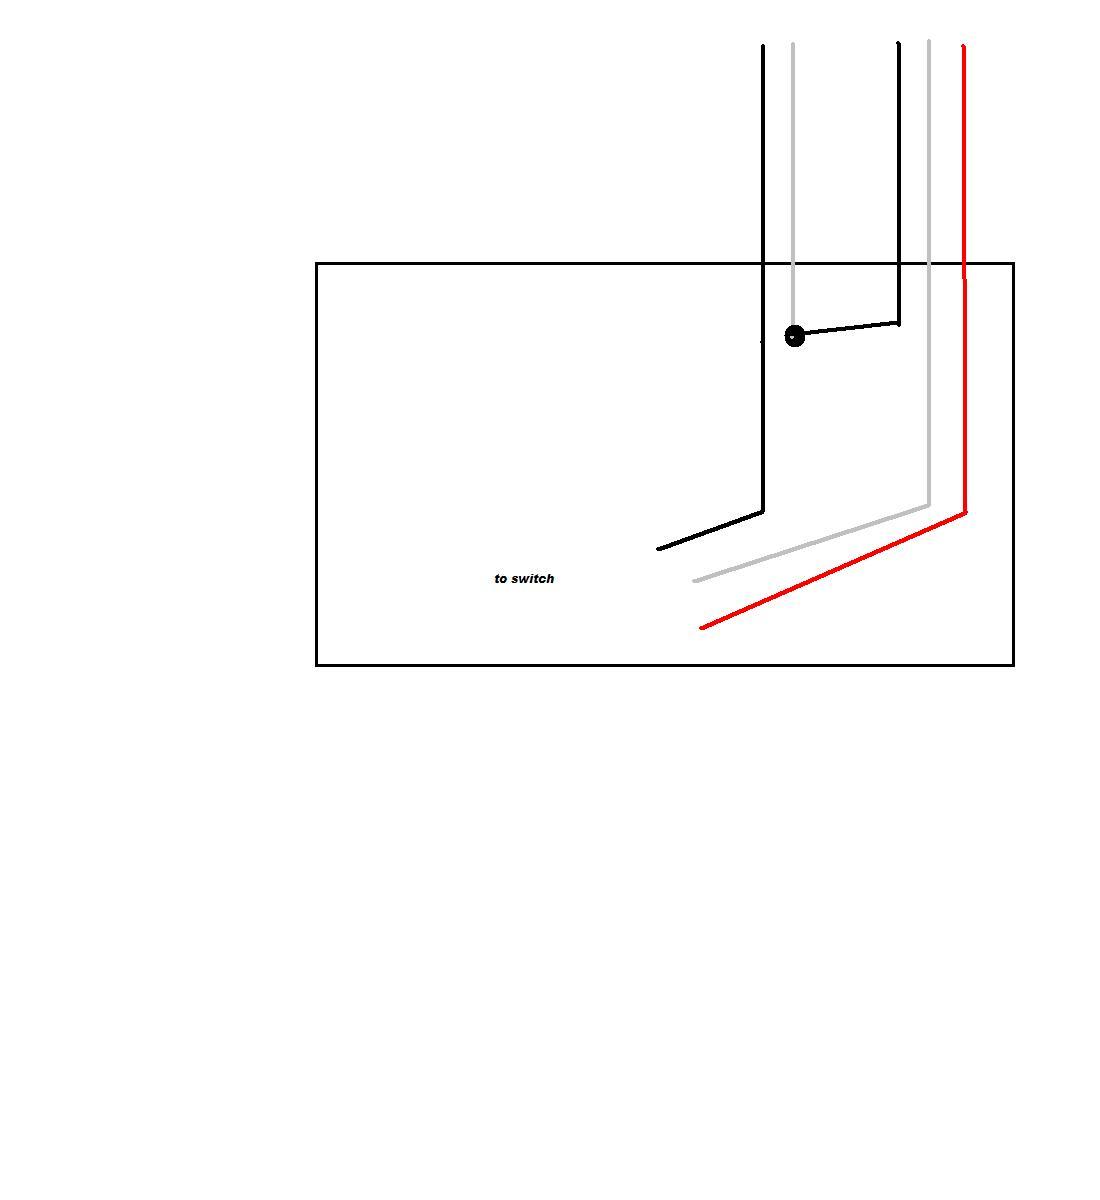 2013 08 07_163942_2gang_box_wiring vacancy sensor wiring diagram lutron ceiling occupancy sensor  at eliteediting.co